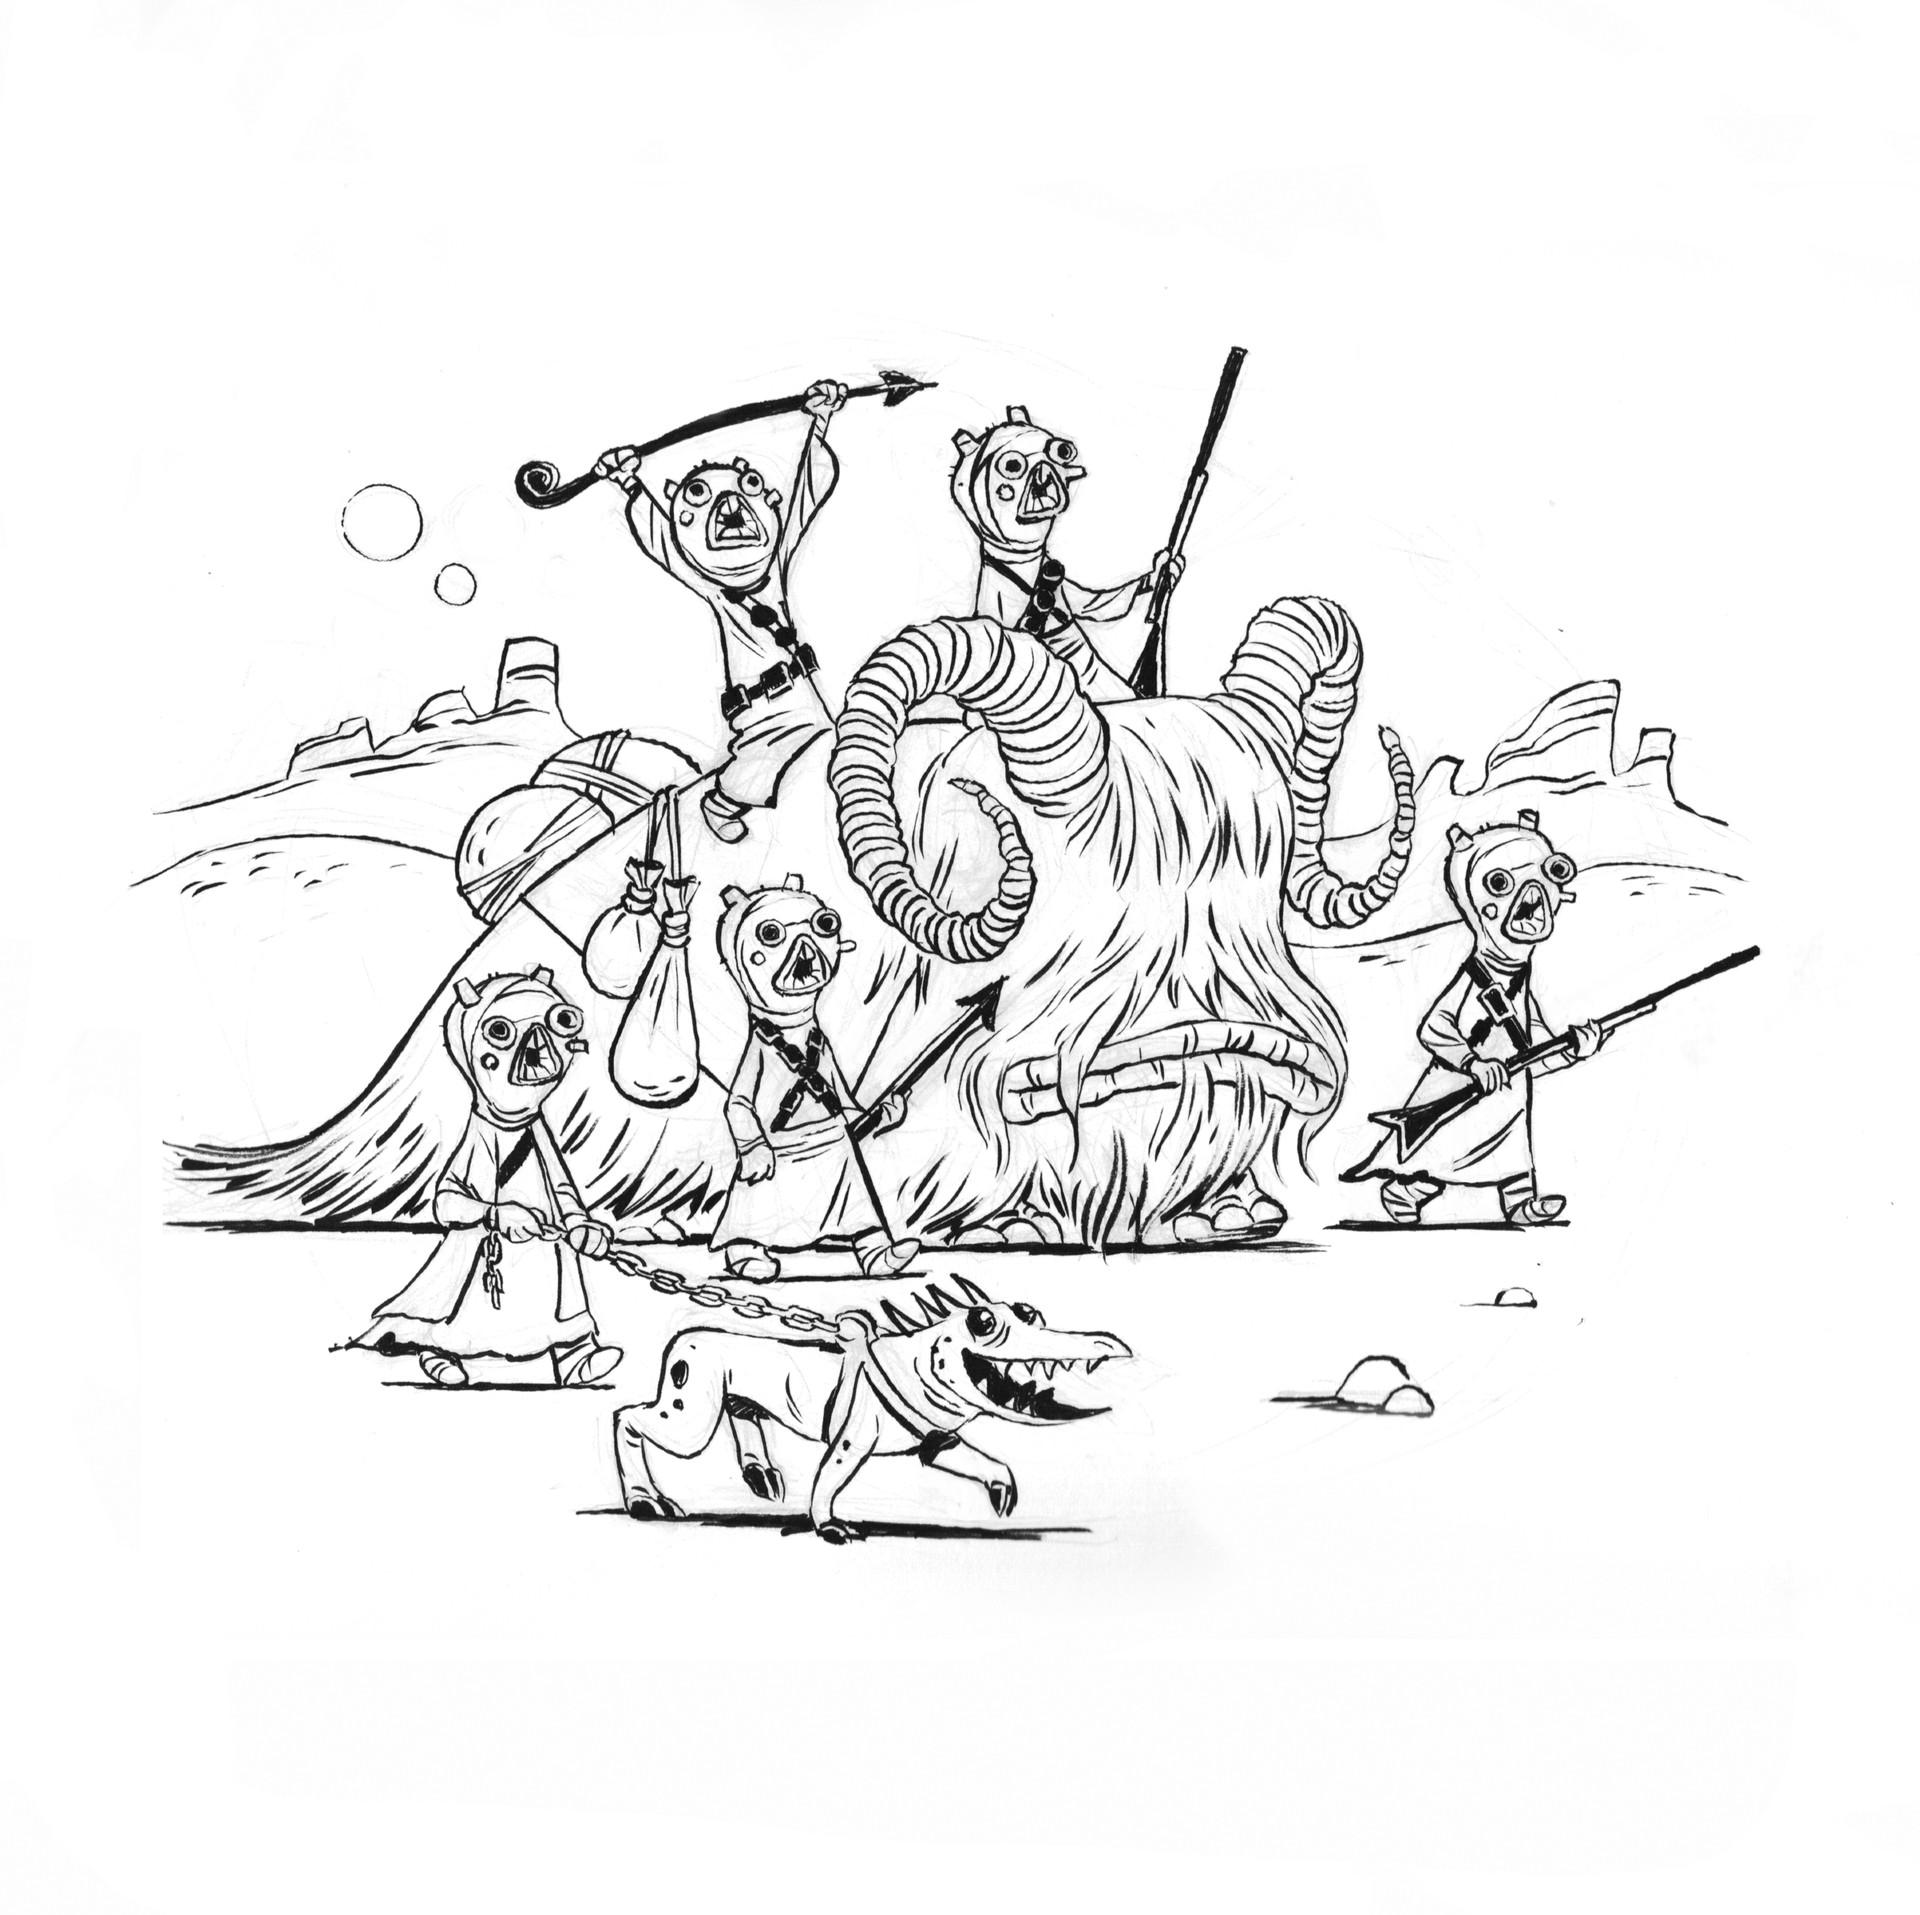 Tusken Raiders sketch